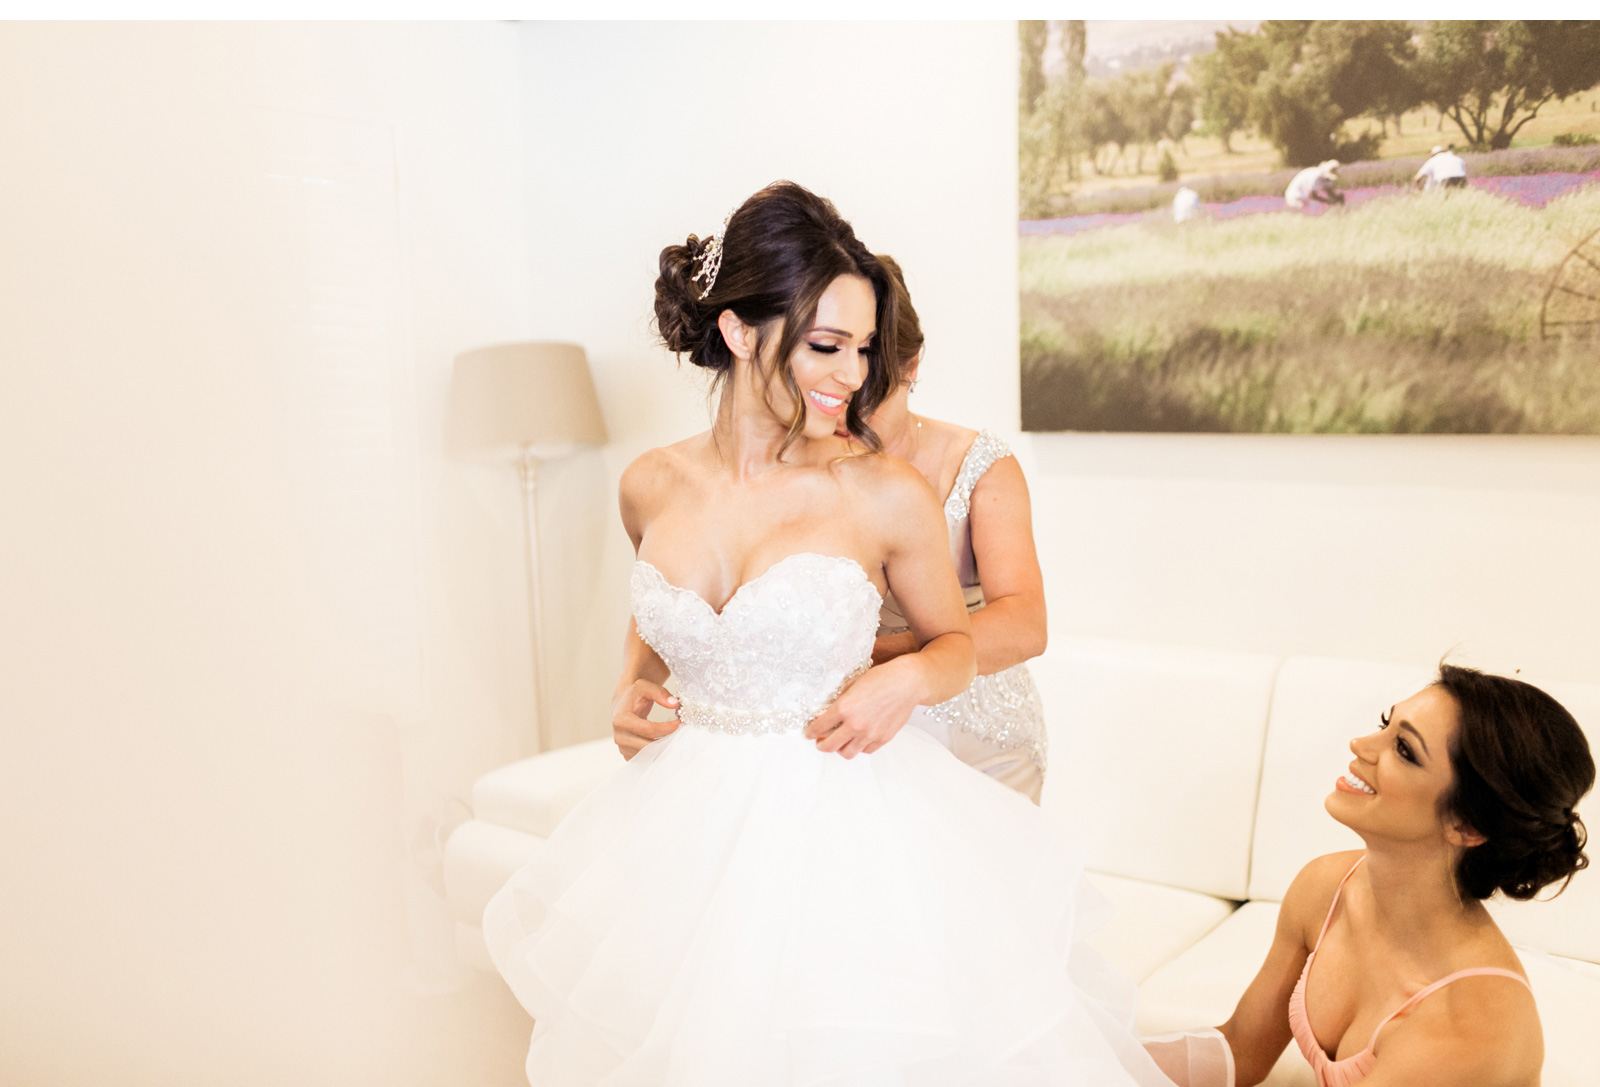 Style-Me-Pretty-Santa-Barbara-Wedding-Photographer-Natalie-Schutt-Photography_15.jpg